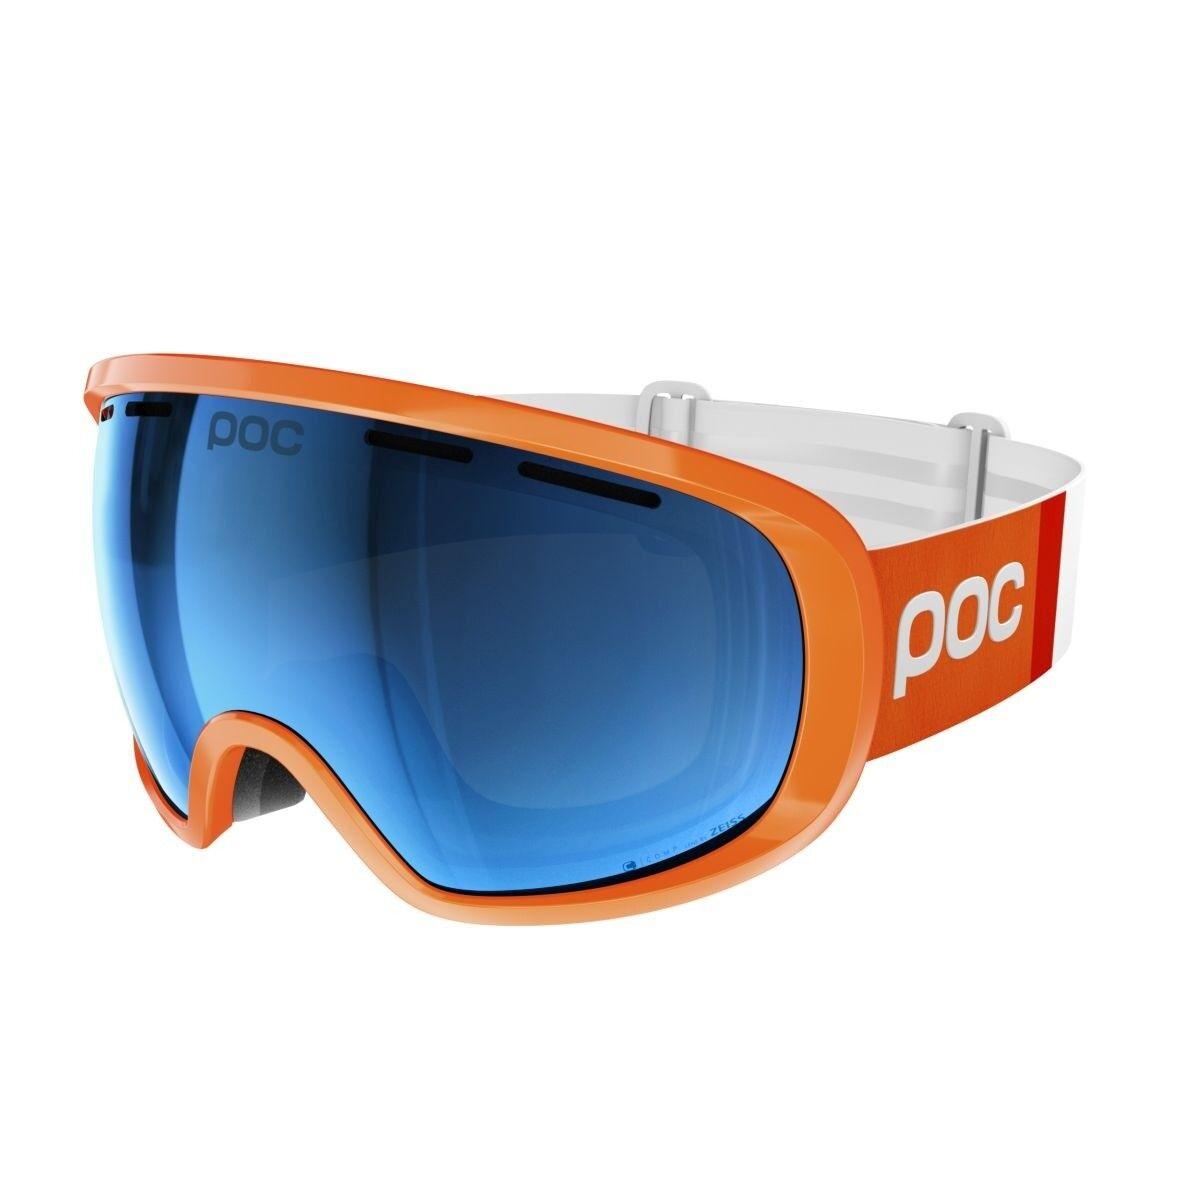 Poc Fovea Clarity Comp Skibrille Orange